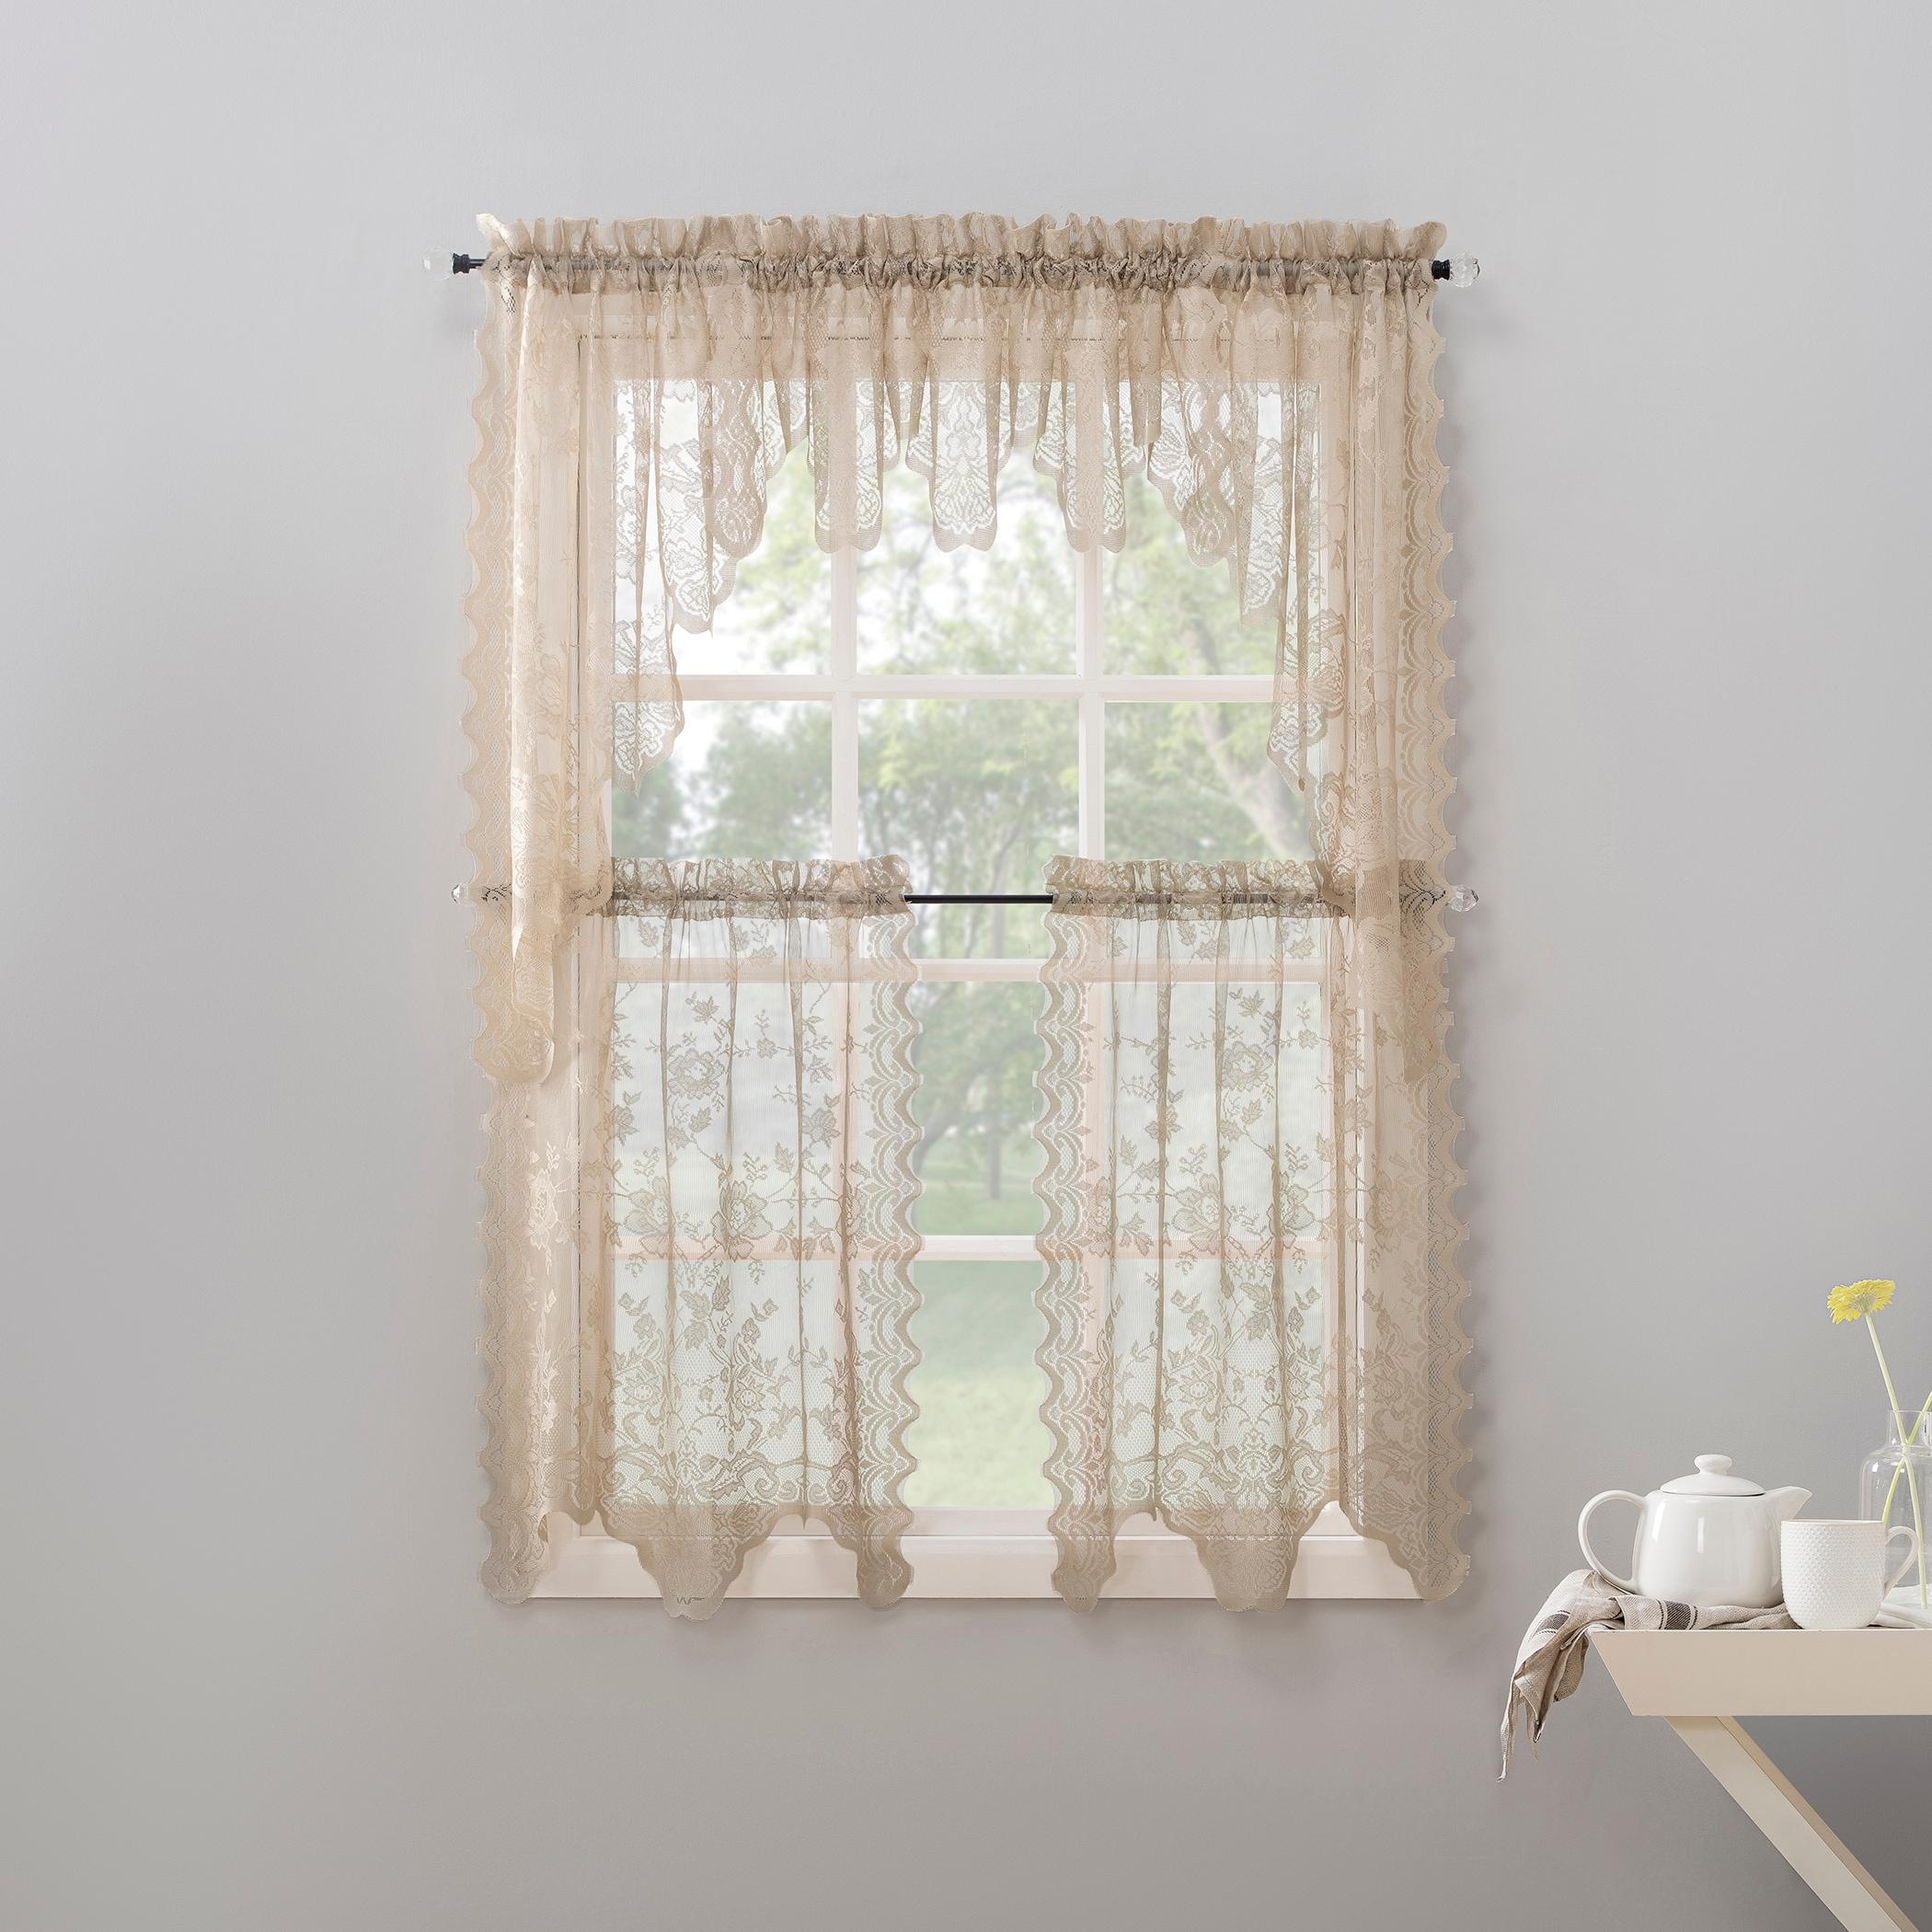 Window Treatments Hardware Floral Window Fresh Curtains Fashion Kitchen Transparent Short Simple Lace Q Home Garden Mbln Org